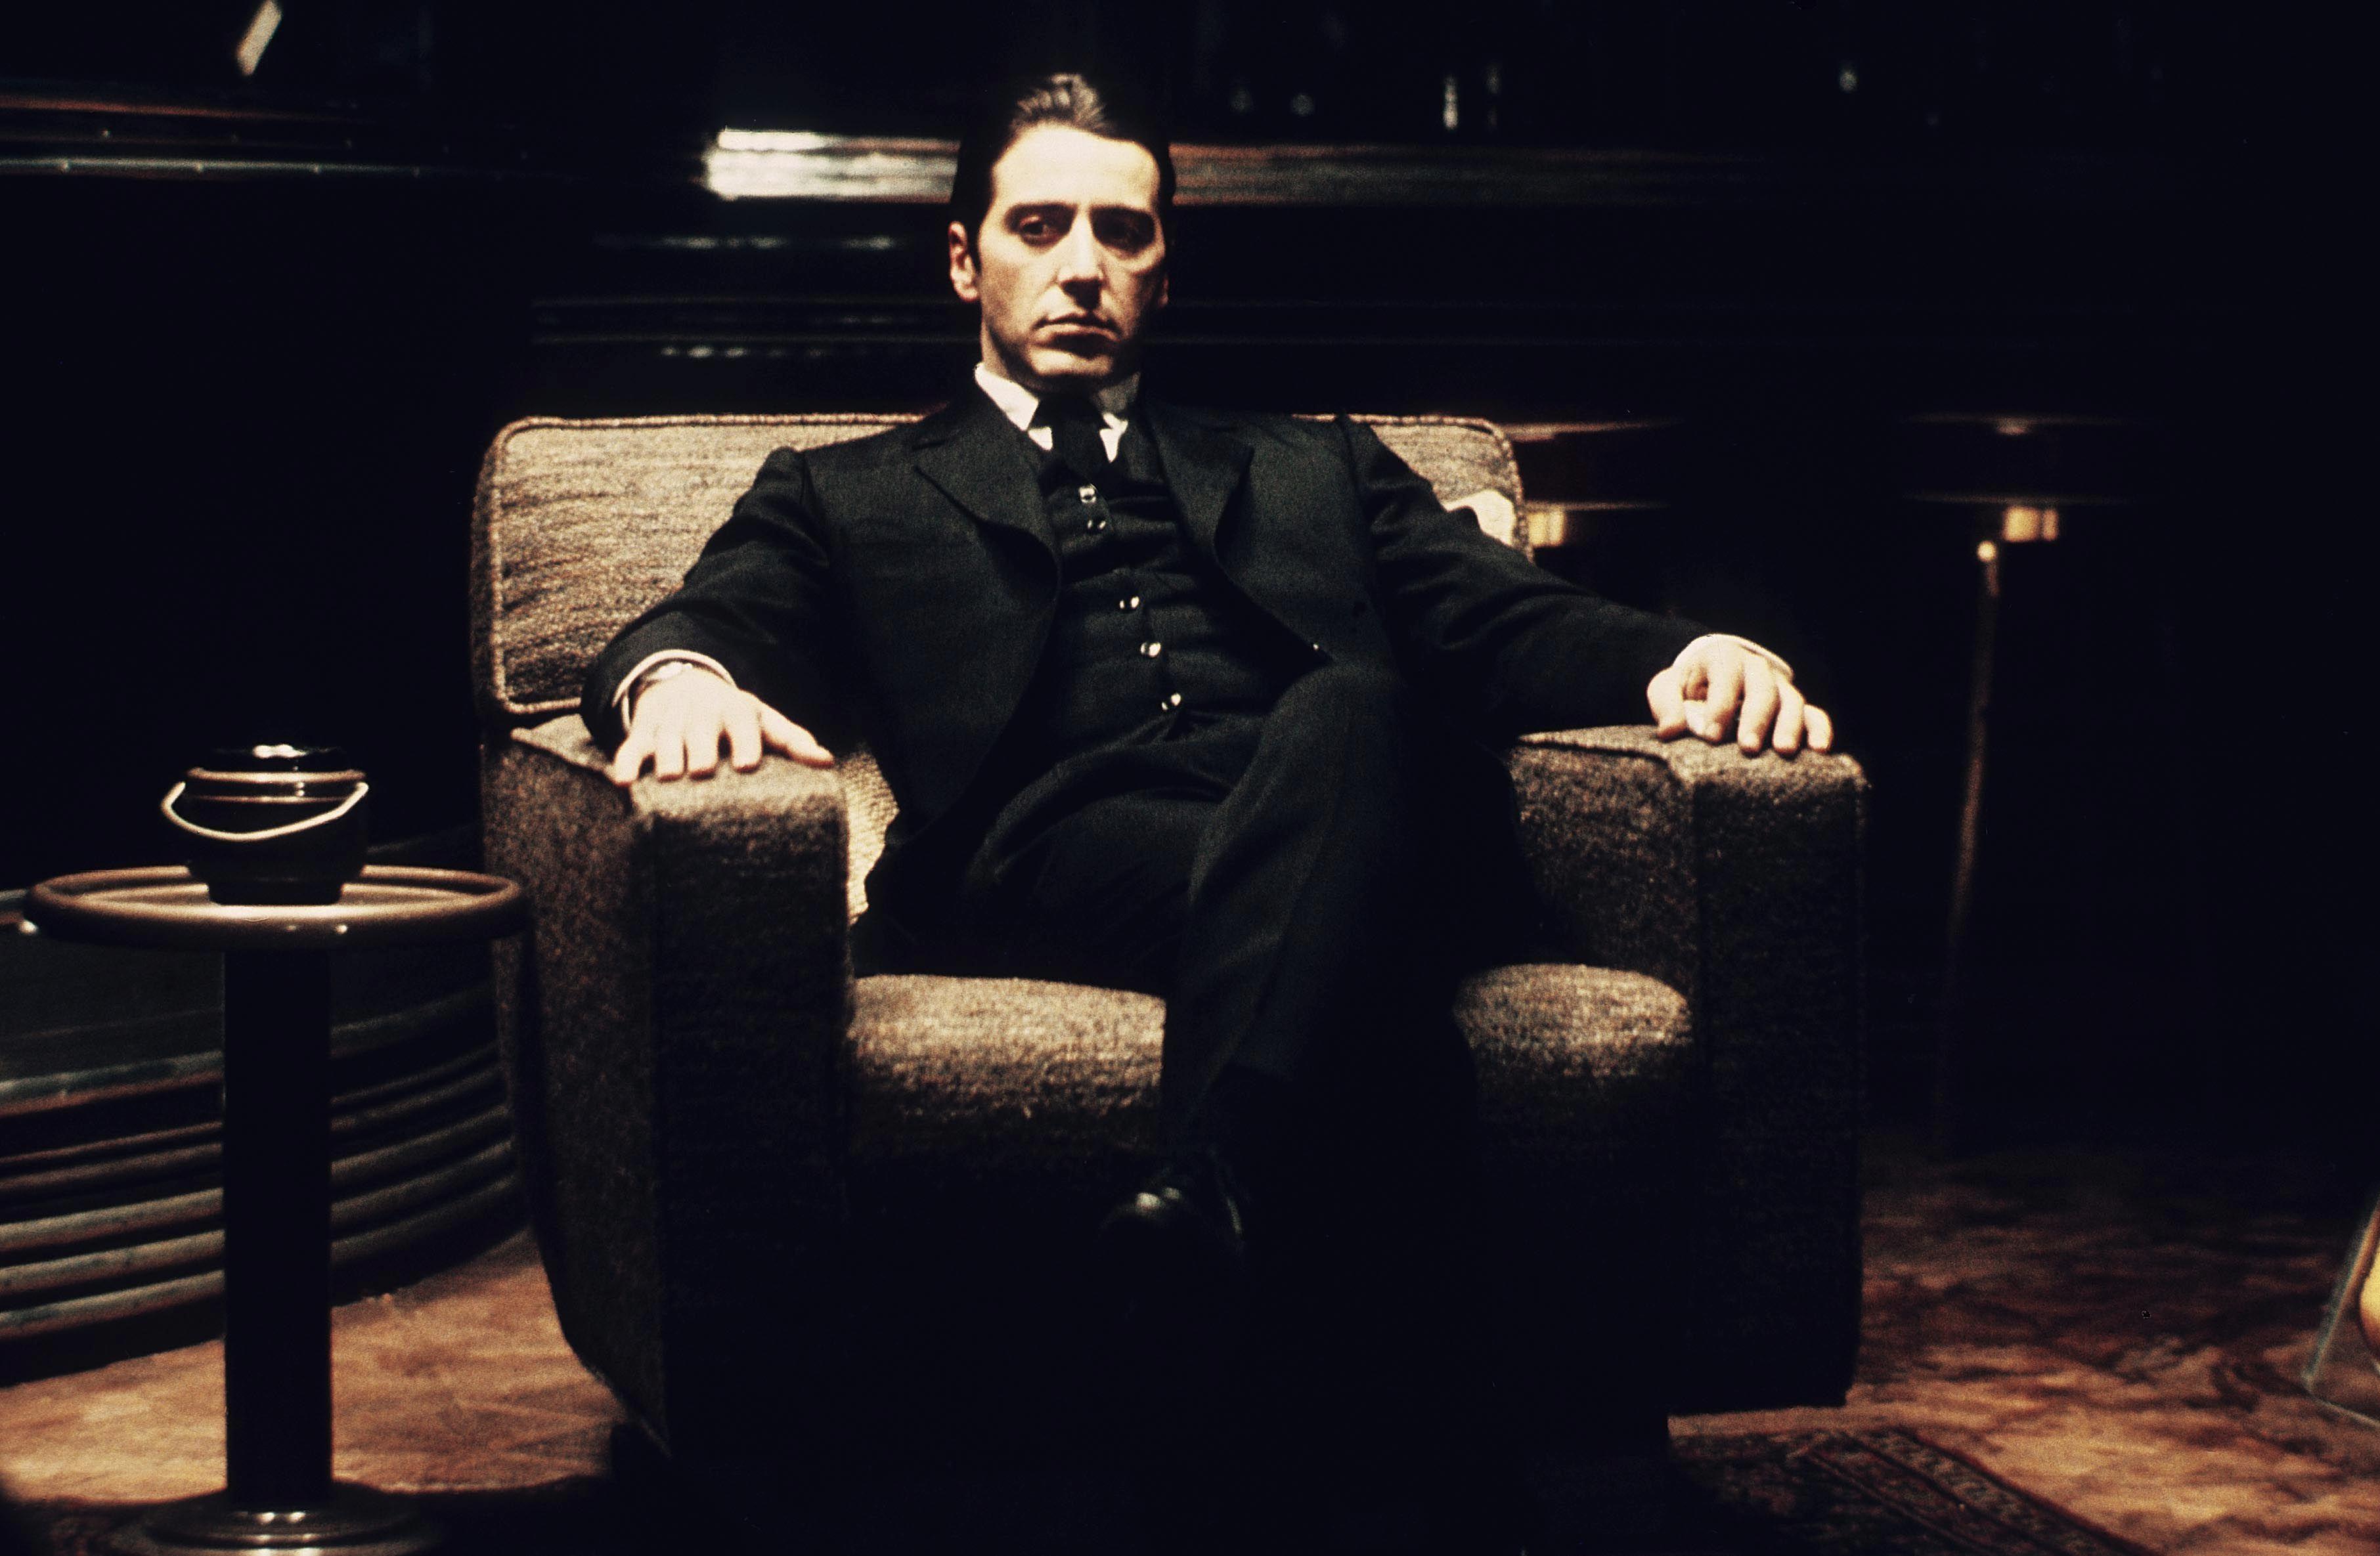 Black suit al pacino clothing fashion pinterest black suits black suit al pacino fandeluxe Gallery